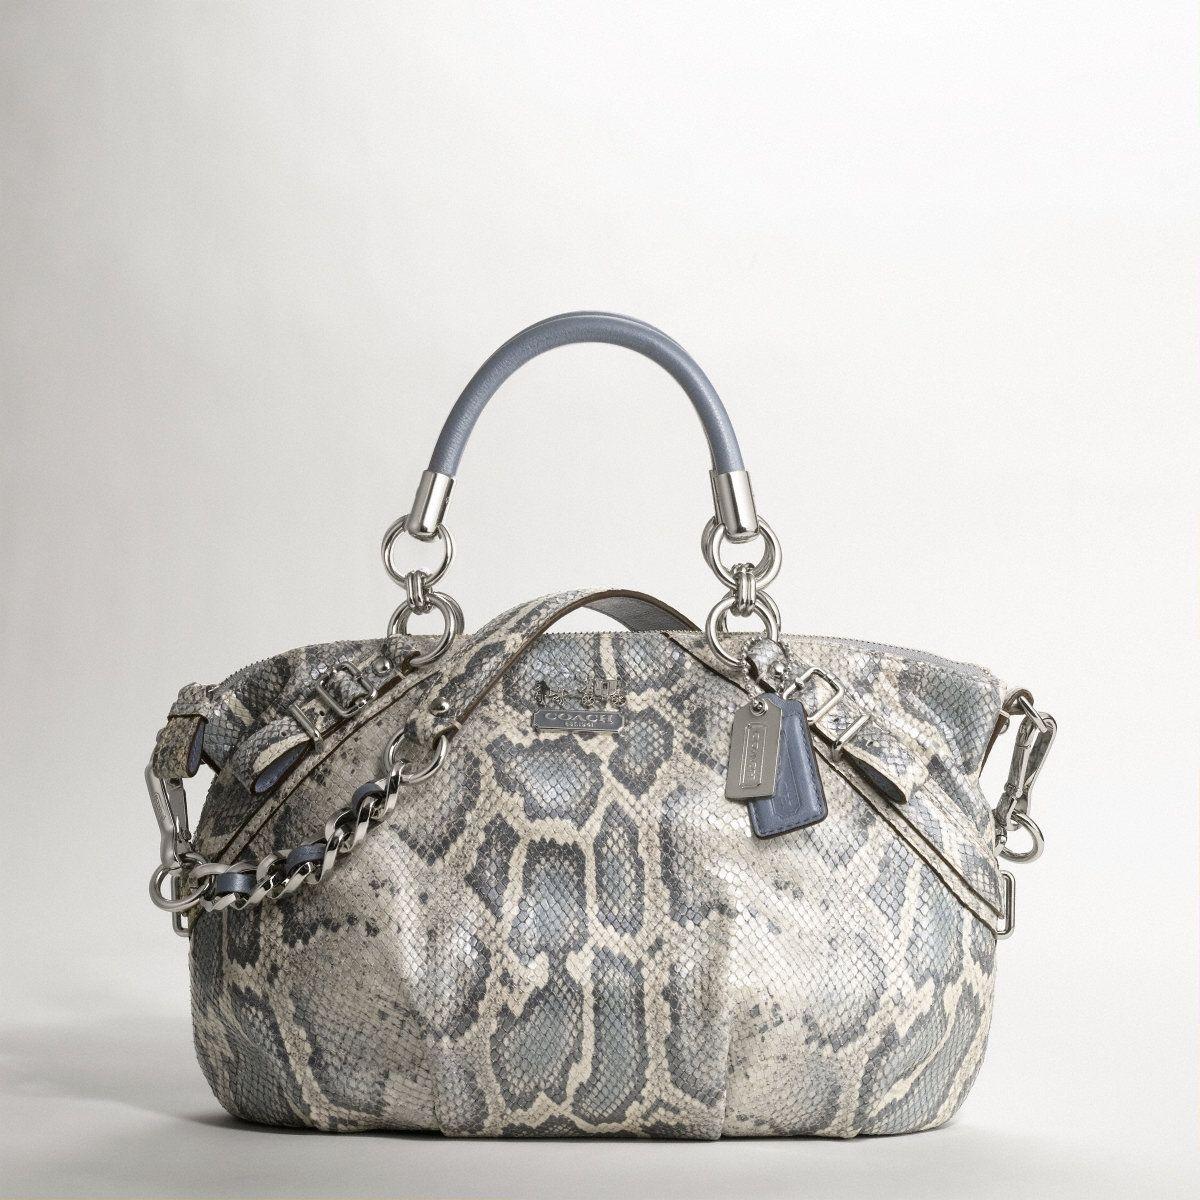 Coach Bags Handbags All Things Fabulous Hobo Bag Python Purses